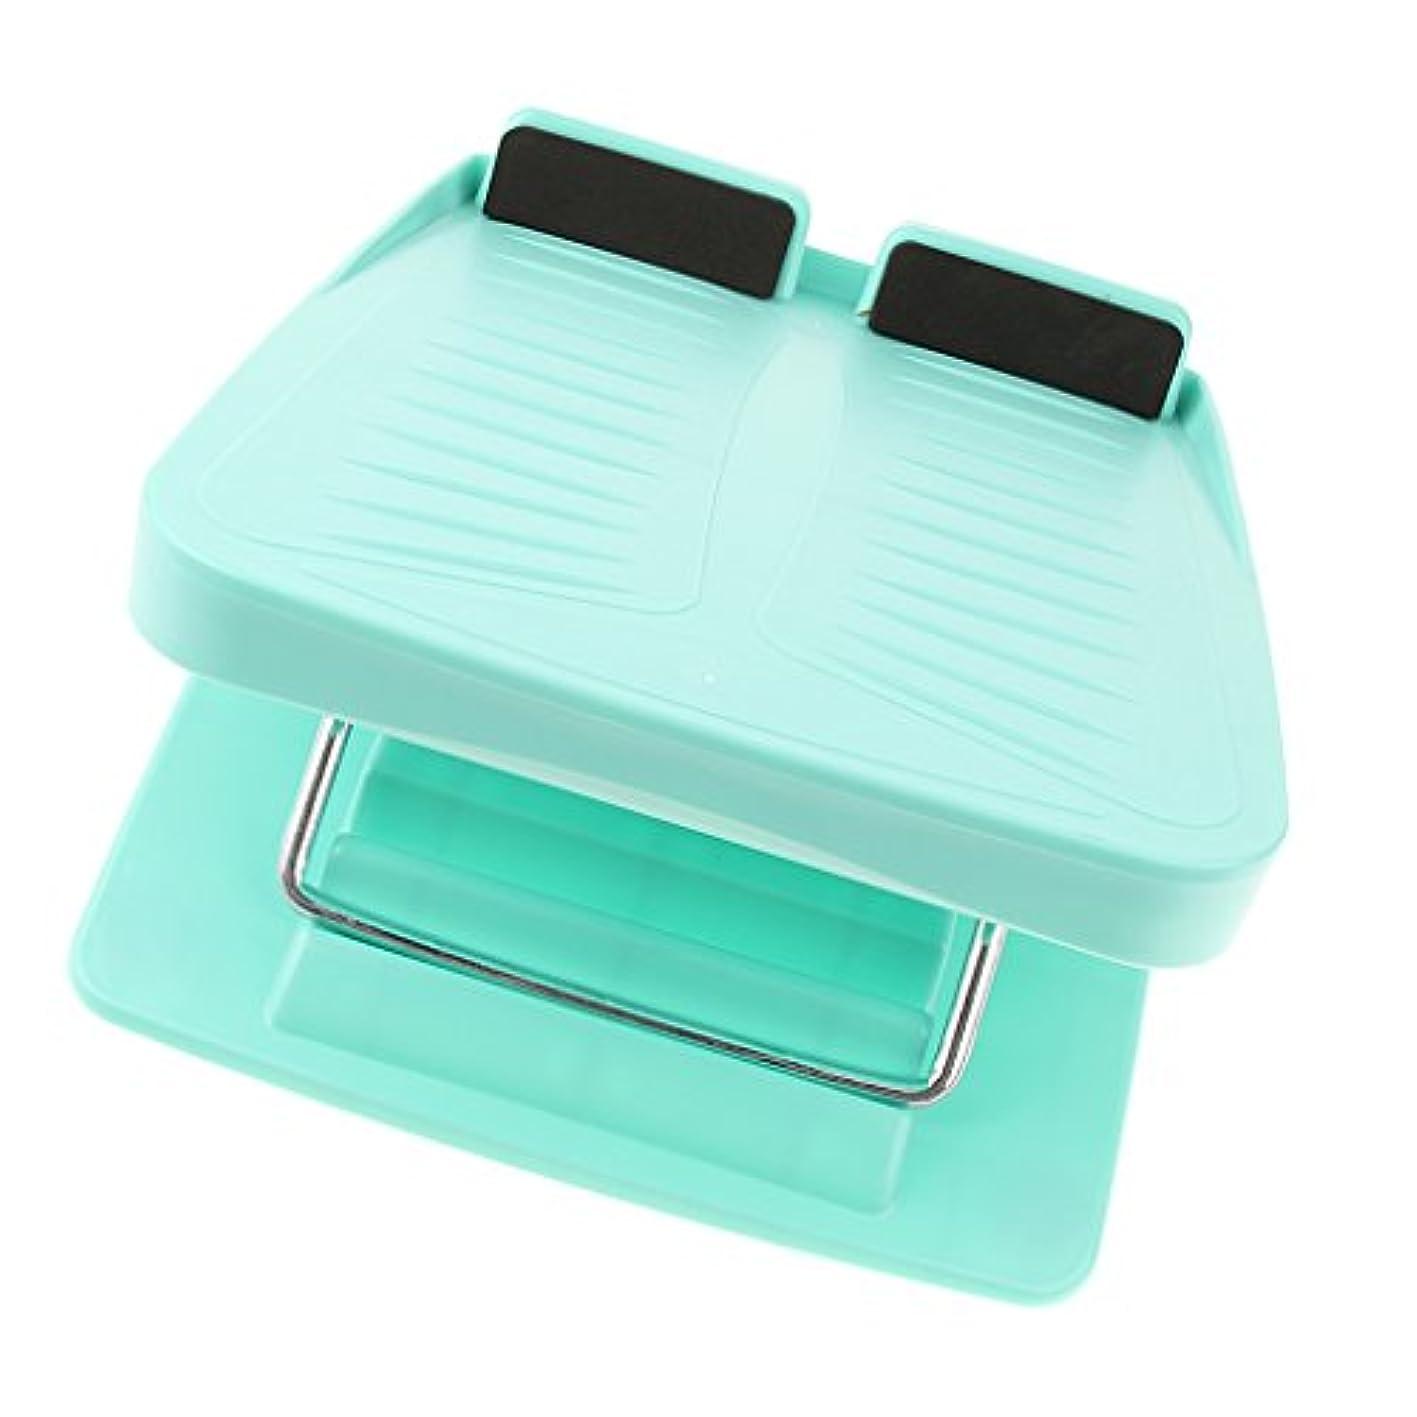 sharprepublic 調整可能 スラントボード アンチスリップ カーフストレッチ 斜面ボード ウェッジストレッチャー 3色 - 青